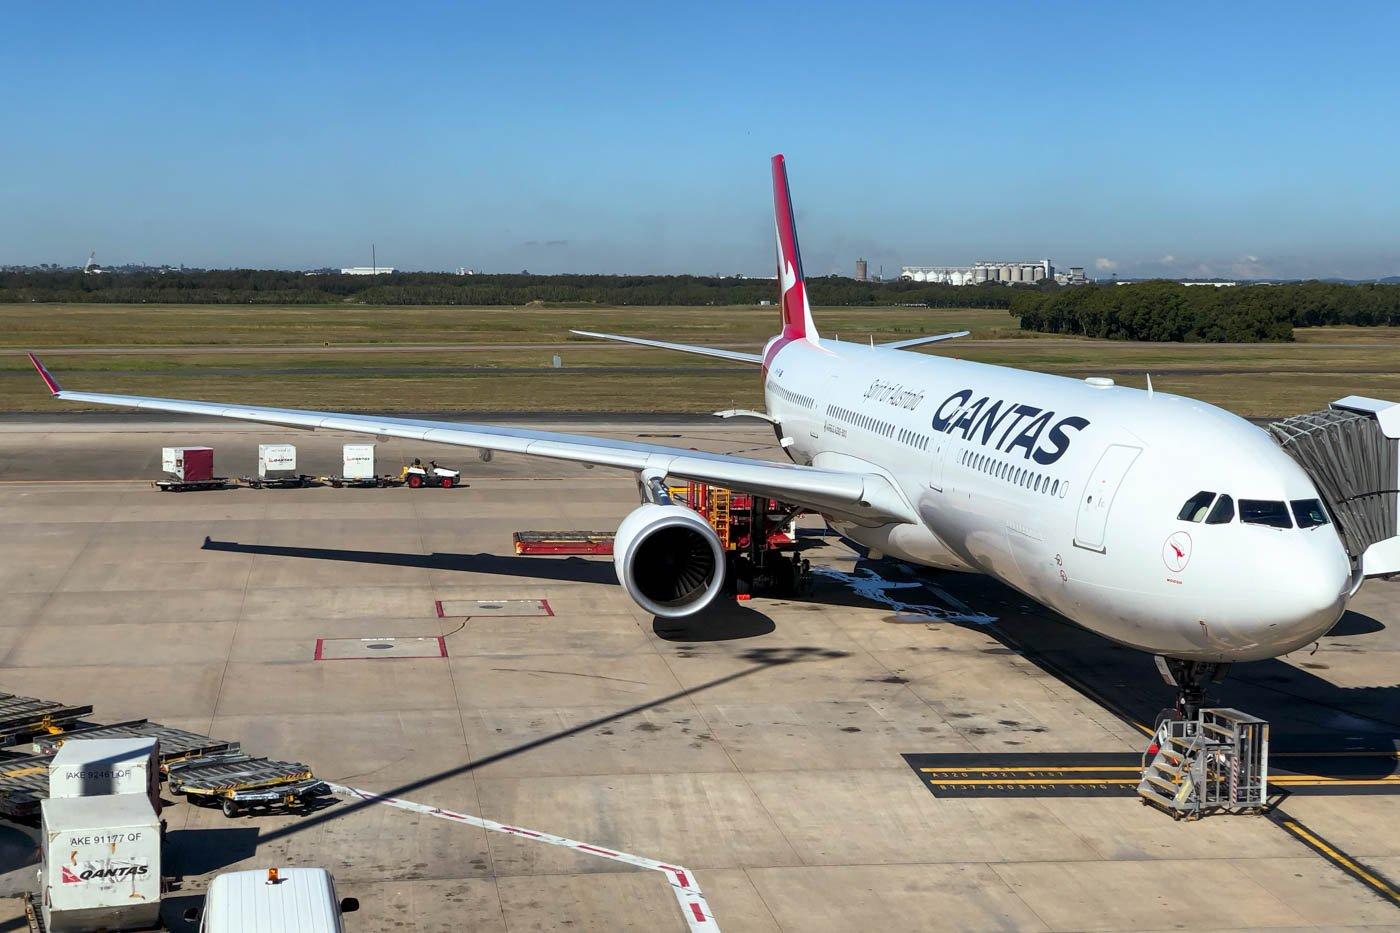 Qantas Airbus A330-300 at Brisbane Airport